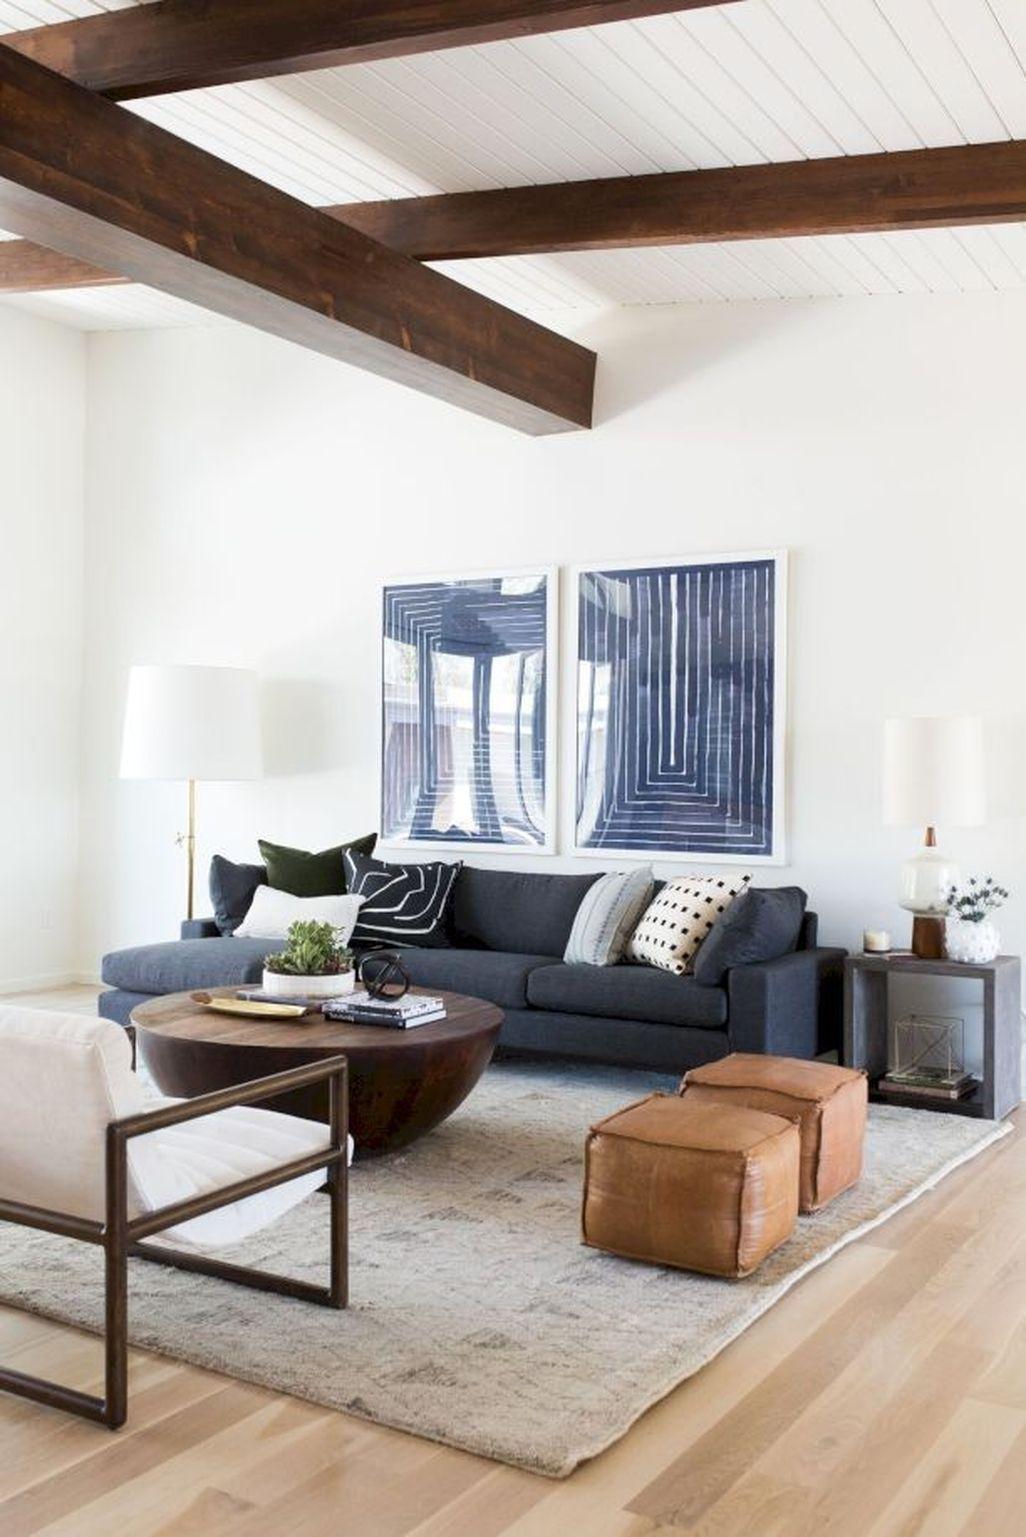 40 Cozy Modern Midcentury Living Room Decorating Ideas | Living room ...